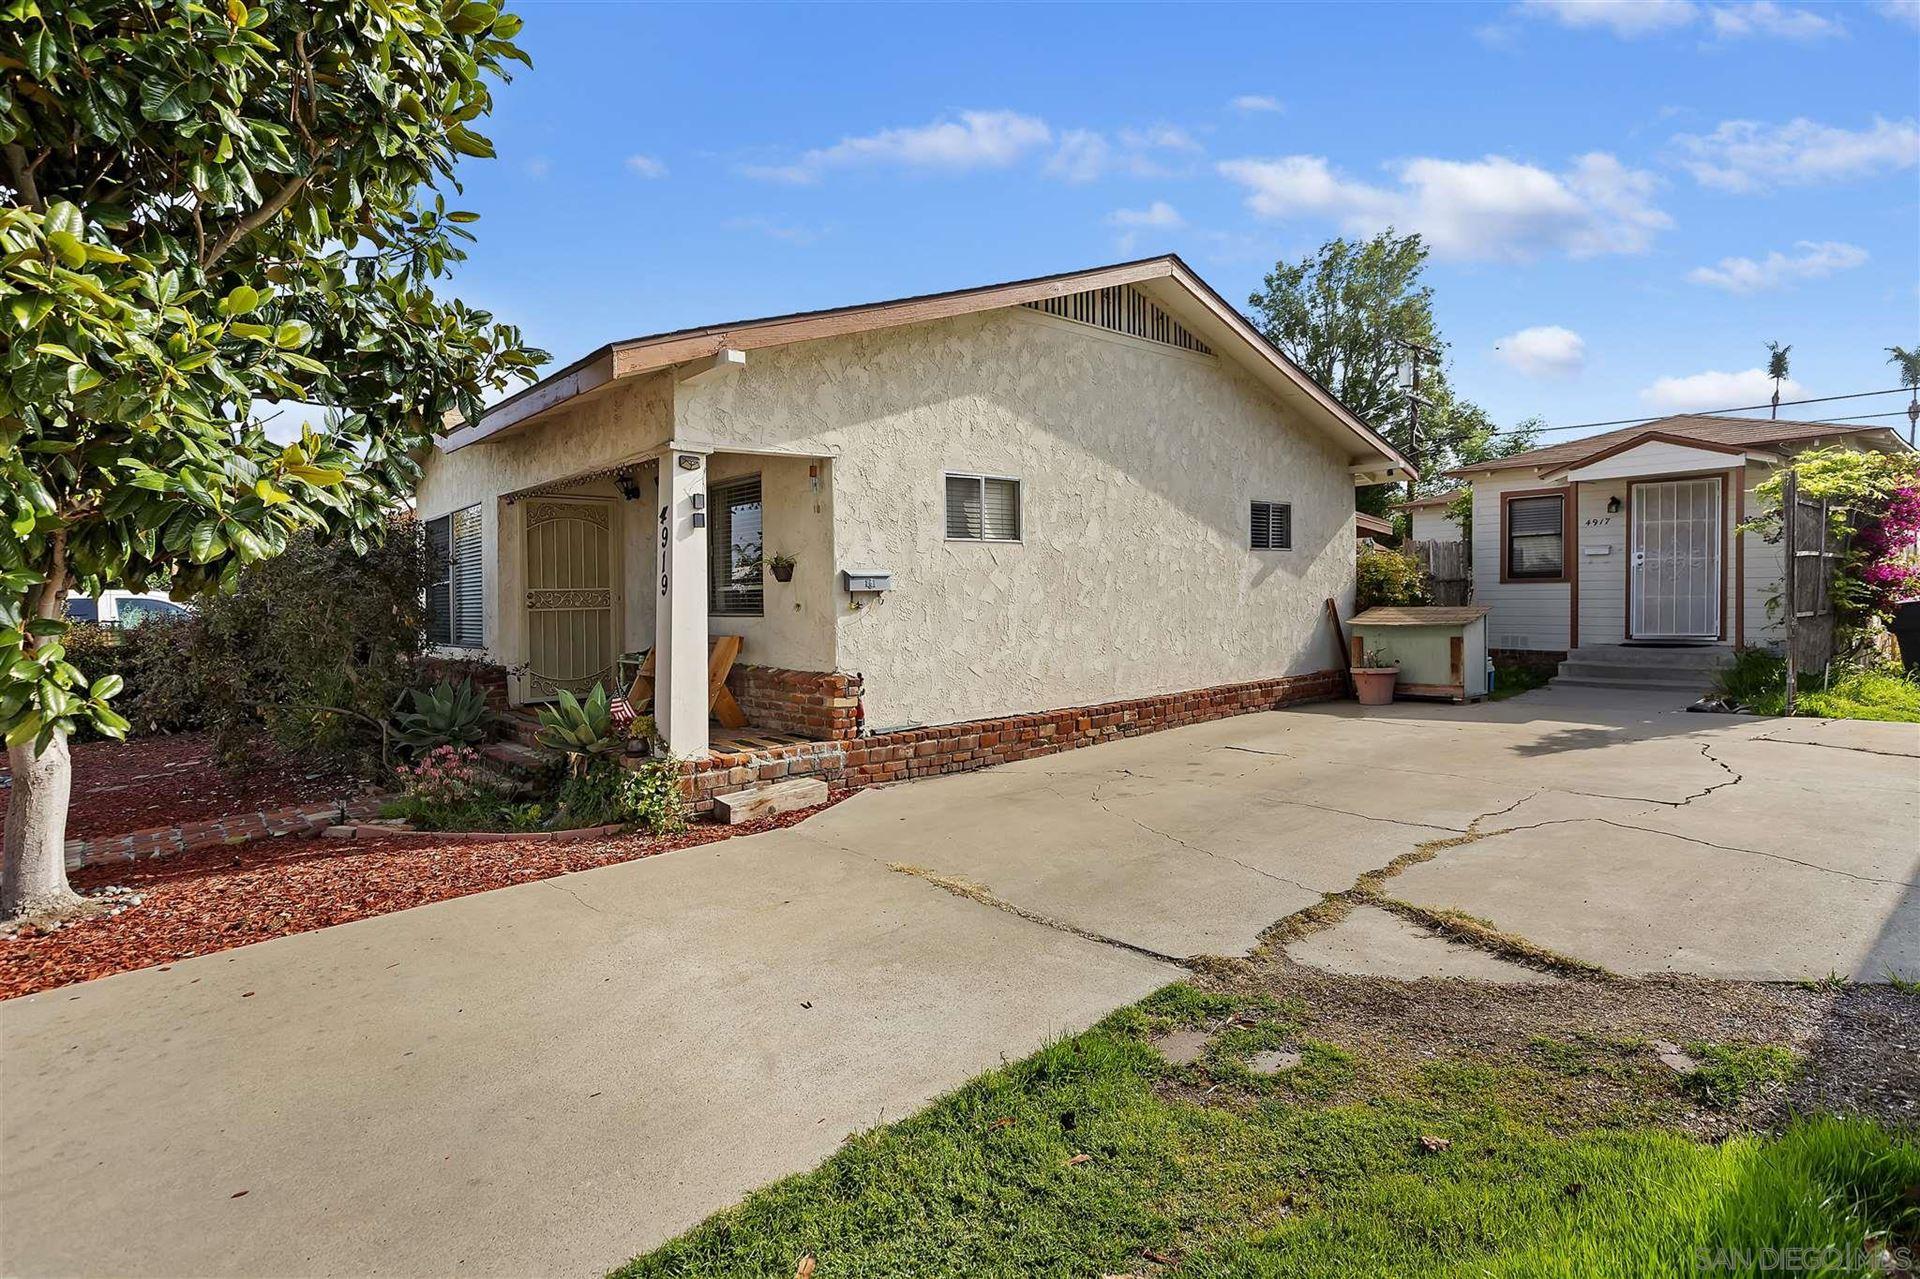 Photo of 4917-4919 Mansfield St, San Diego, CA 92116 (MLS # 210008650)